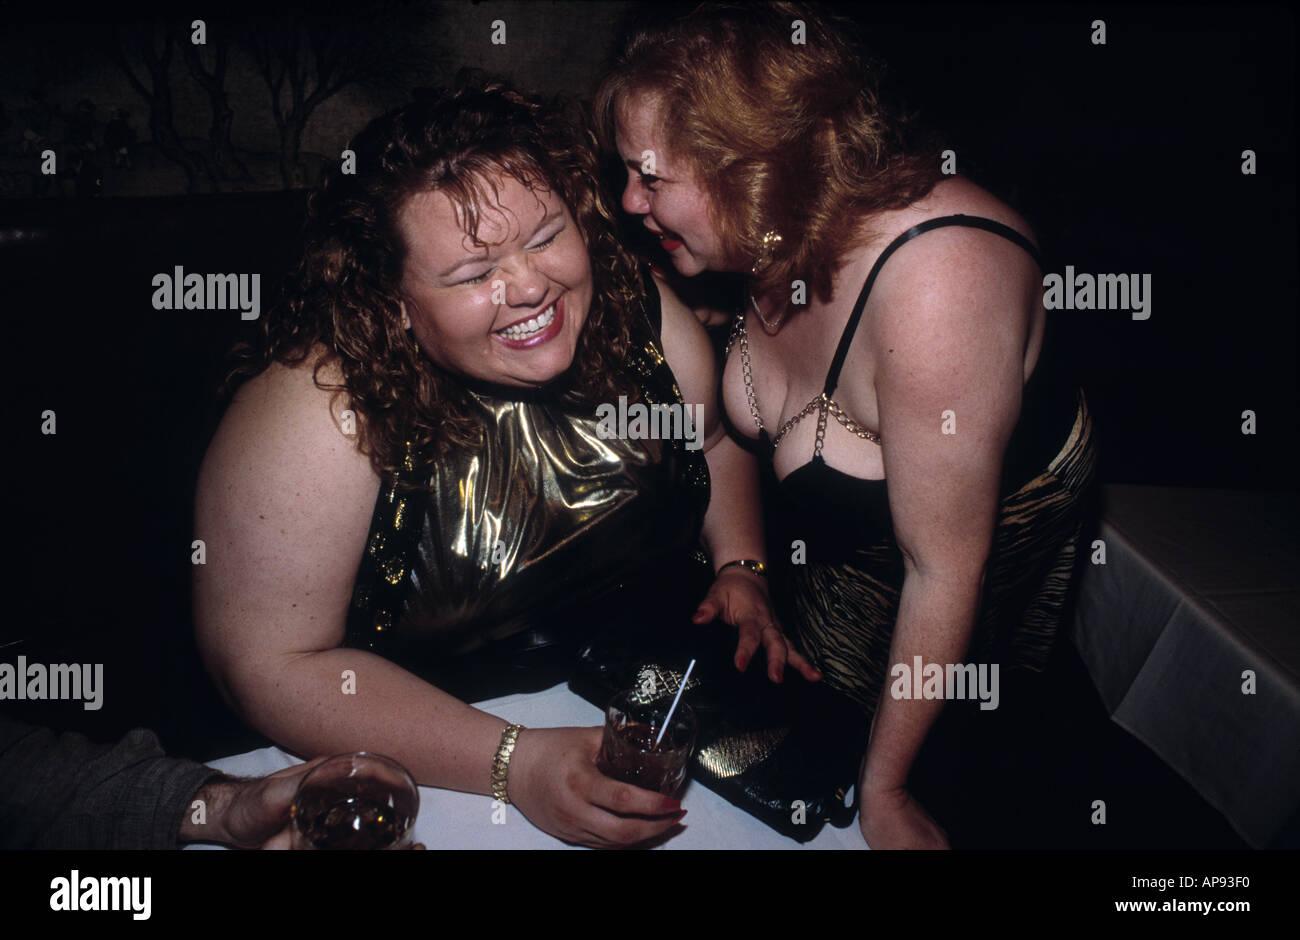 Mature nightclubs in nyc